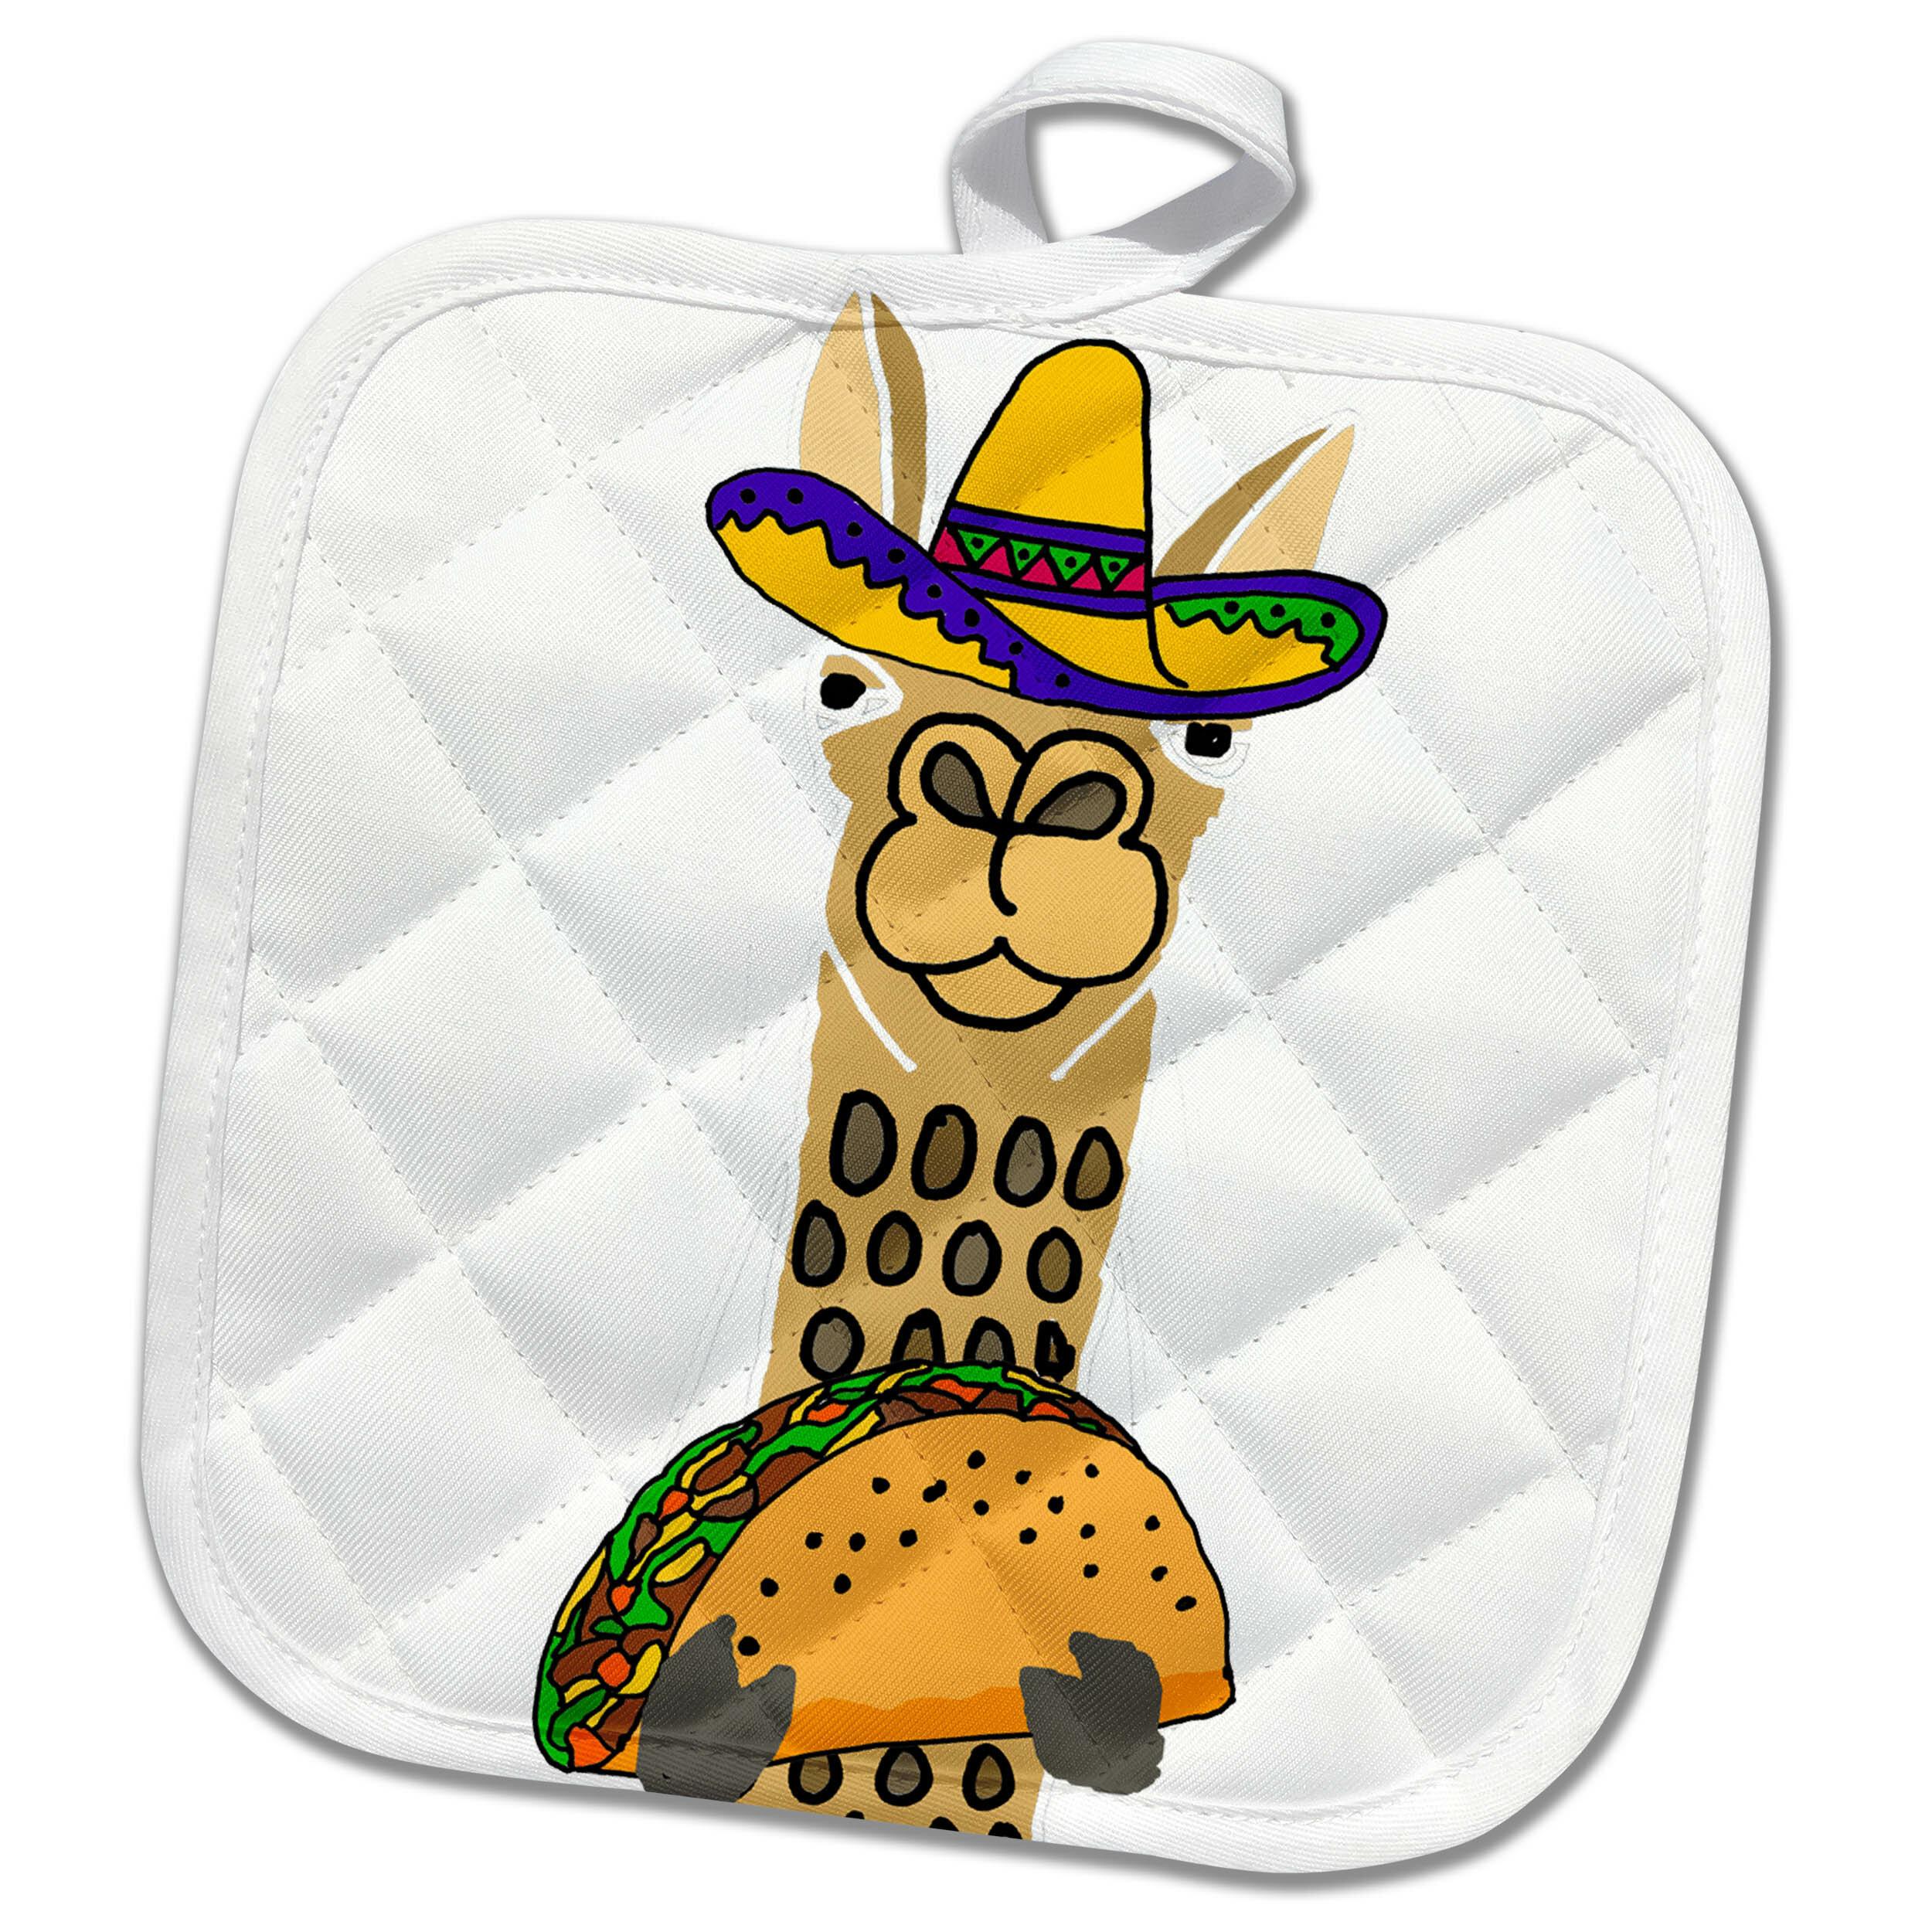 3drose Funny Cute Llama Wearing Sombrero And Eating Taco Cartoon Potholder Wayfair